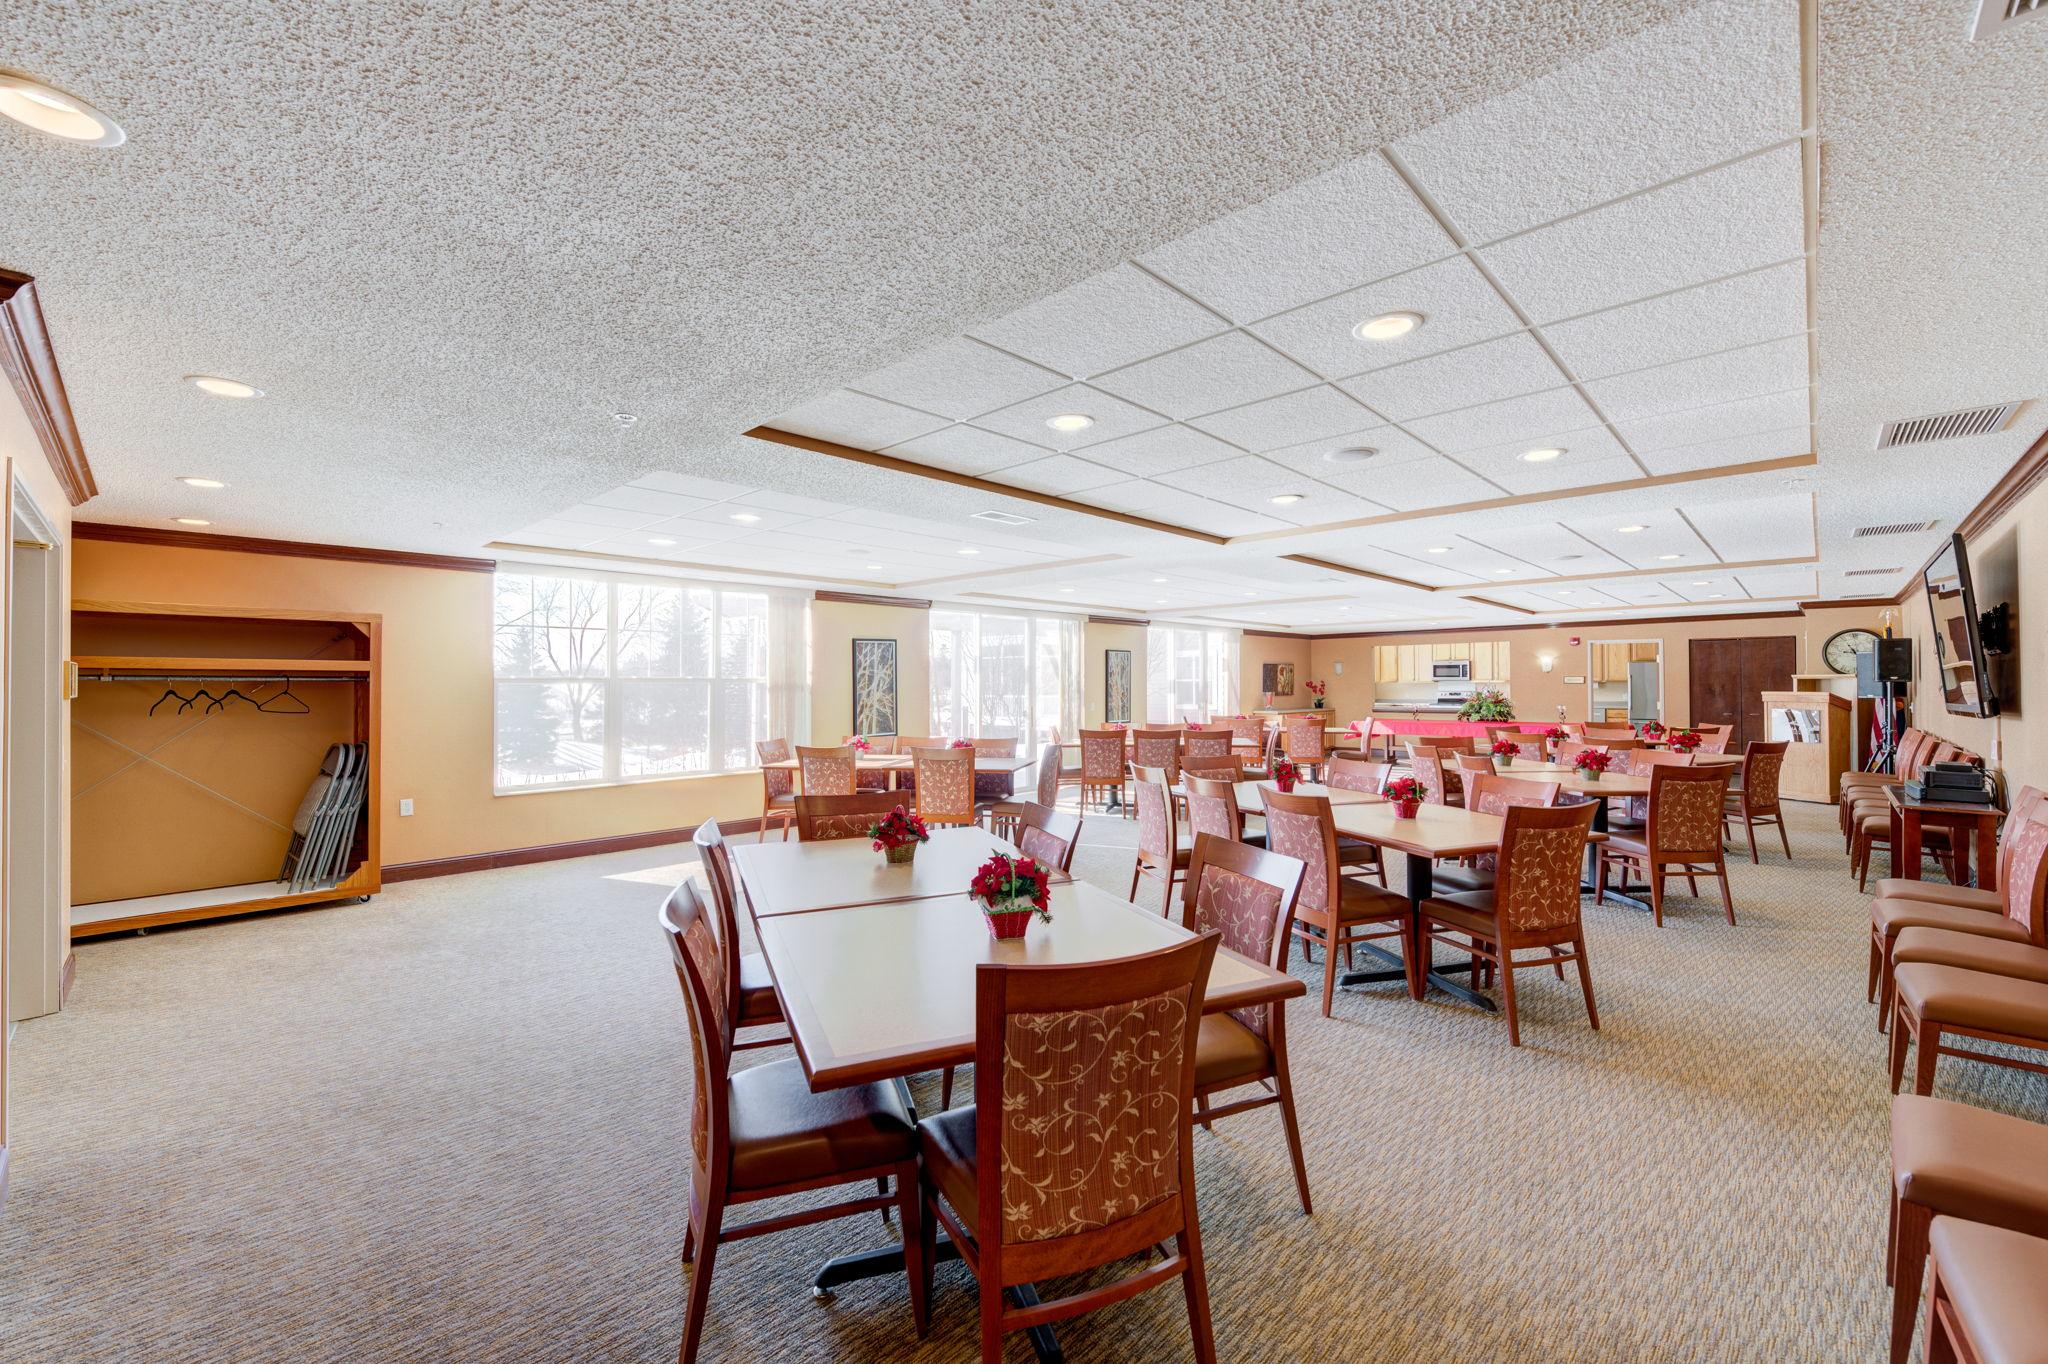 Ridge Room/Dining Room